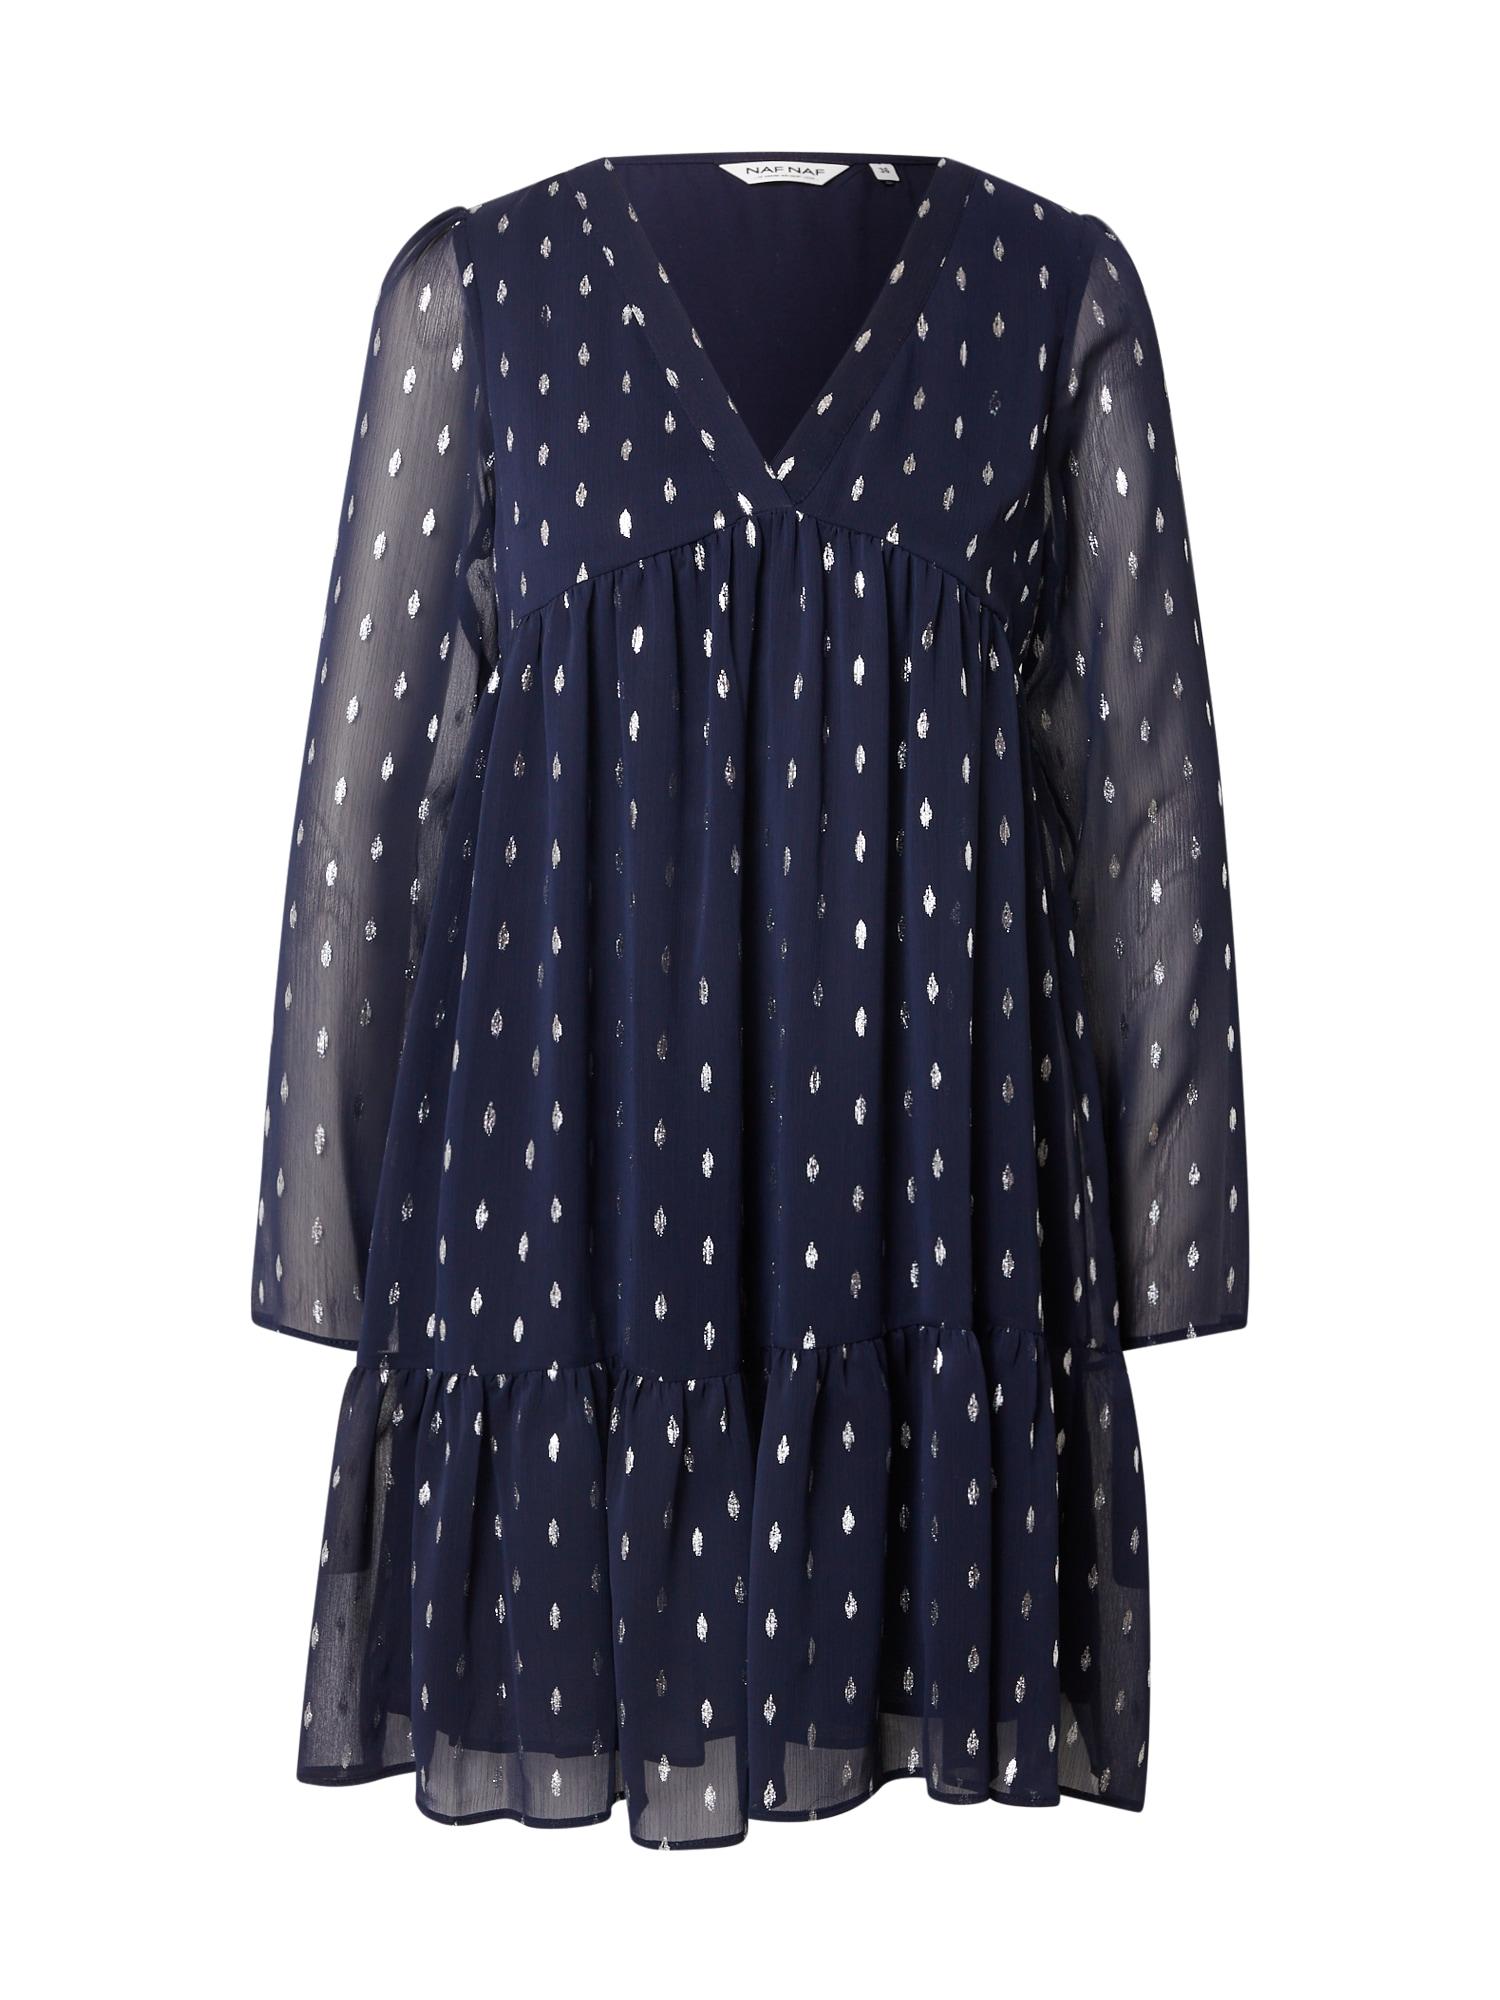 NAF NAF Suknelė tamsiai mėlyna jūros spalva / sidabrinė